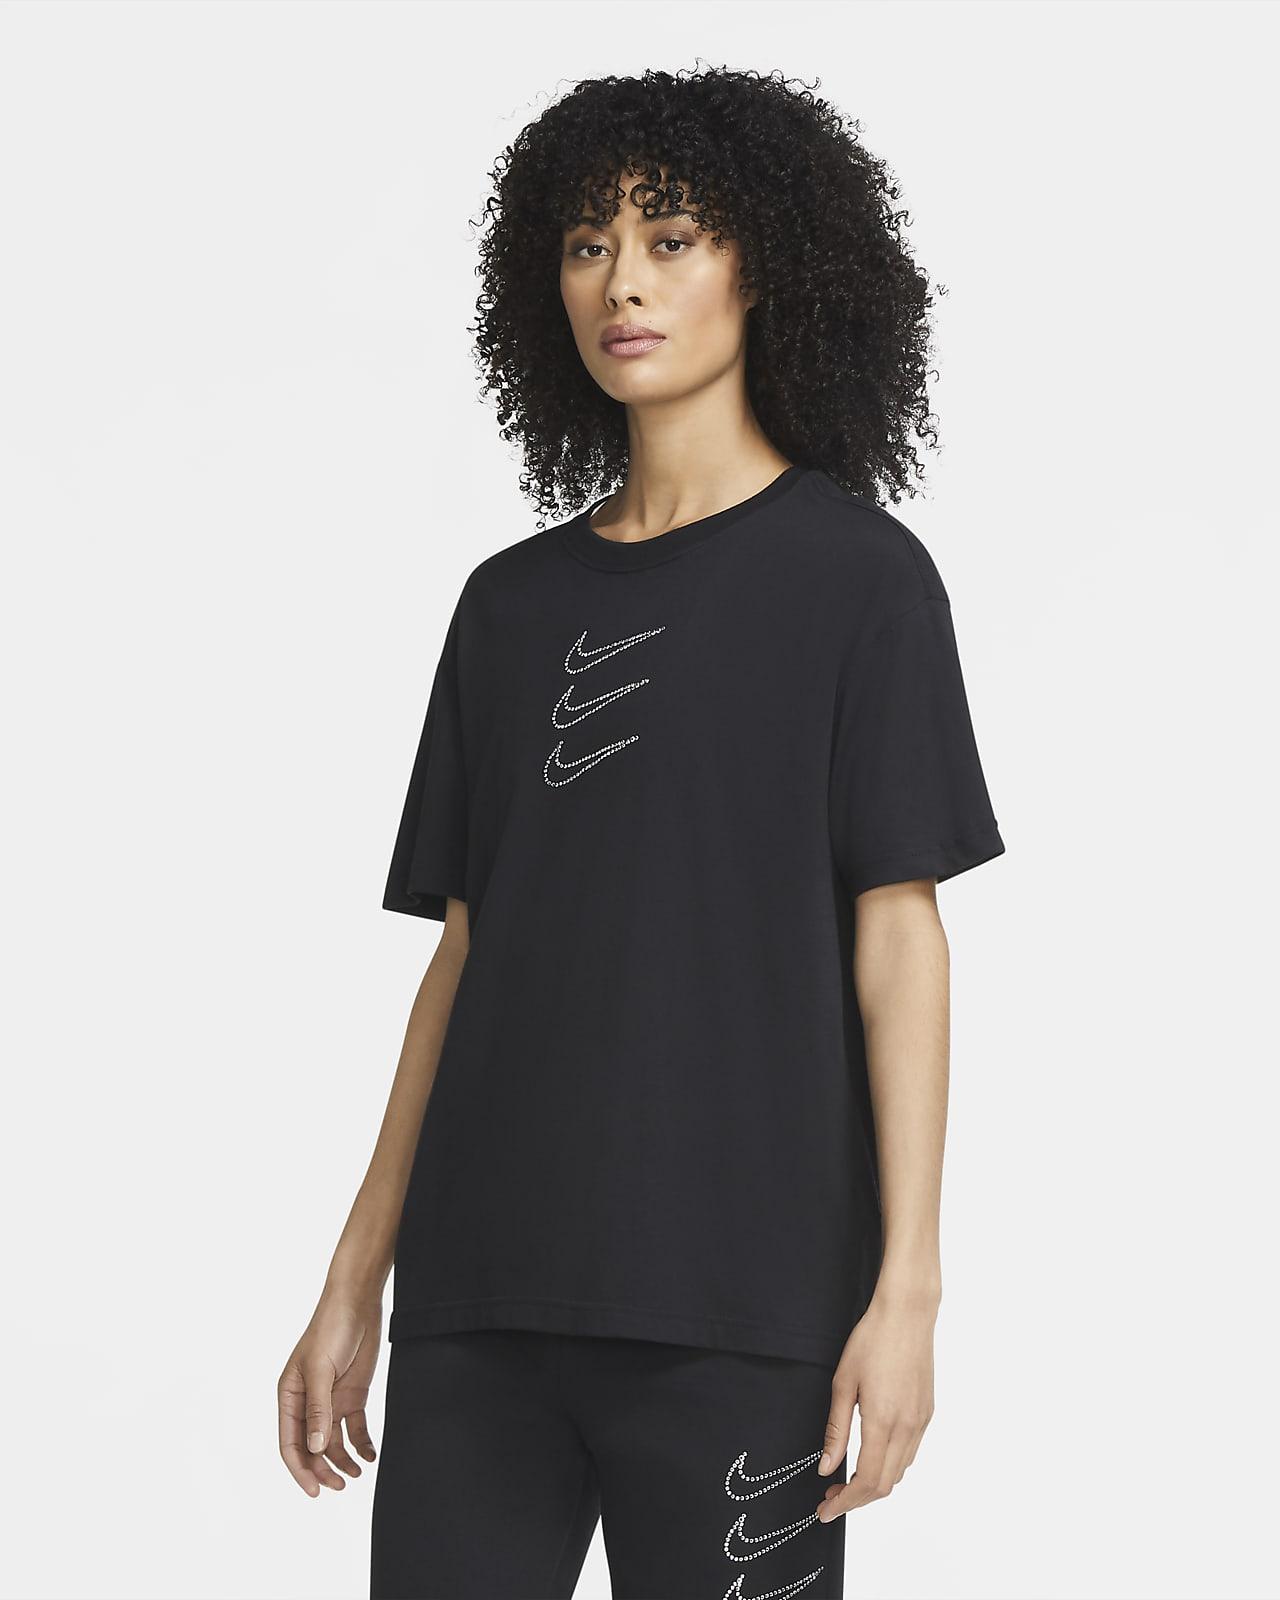 T-shirt Nike Sportswear para mulher